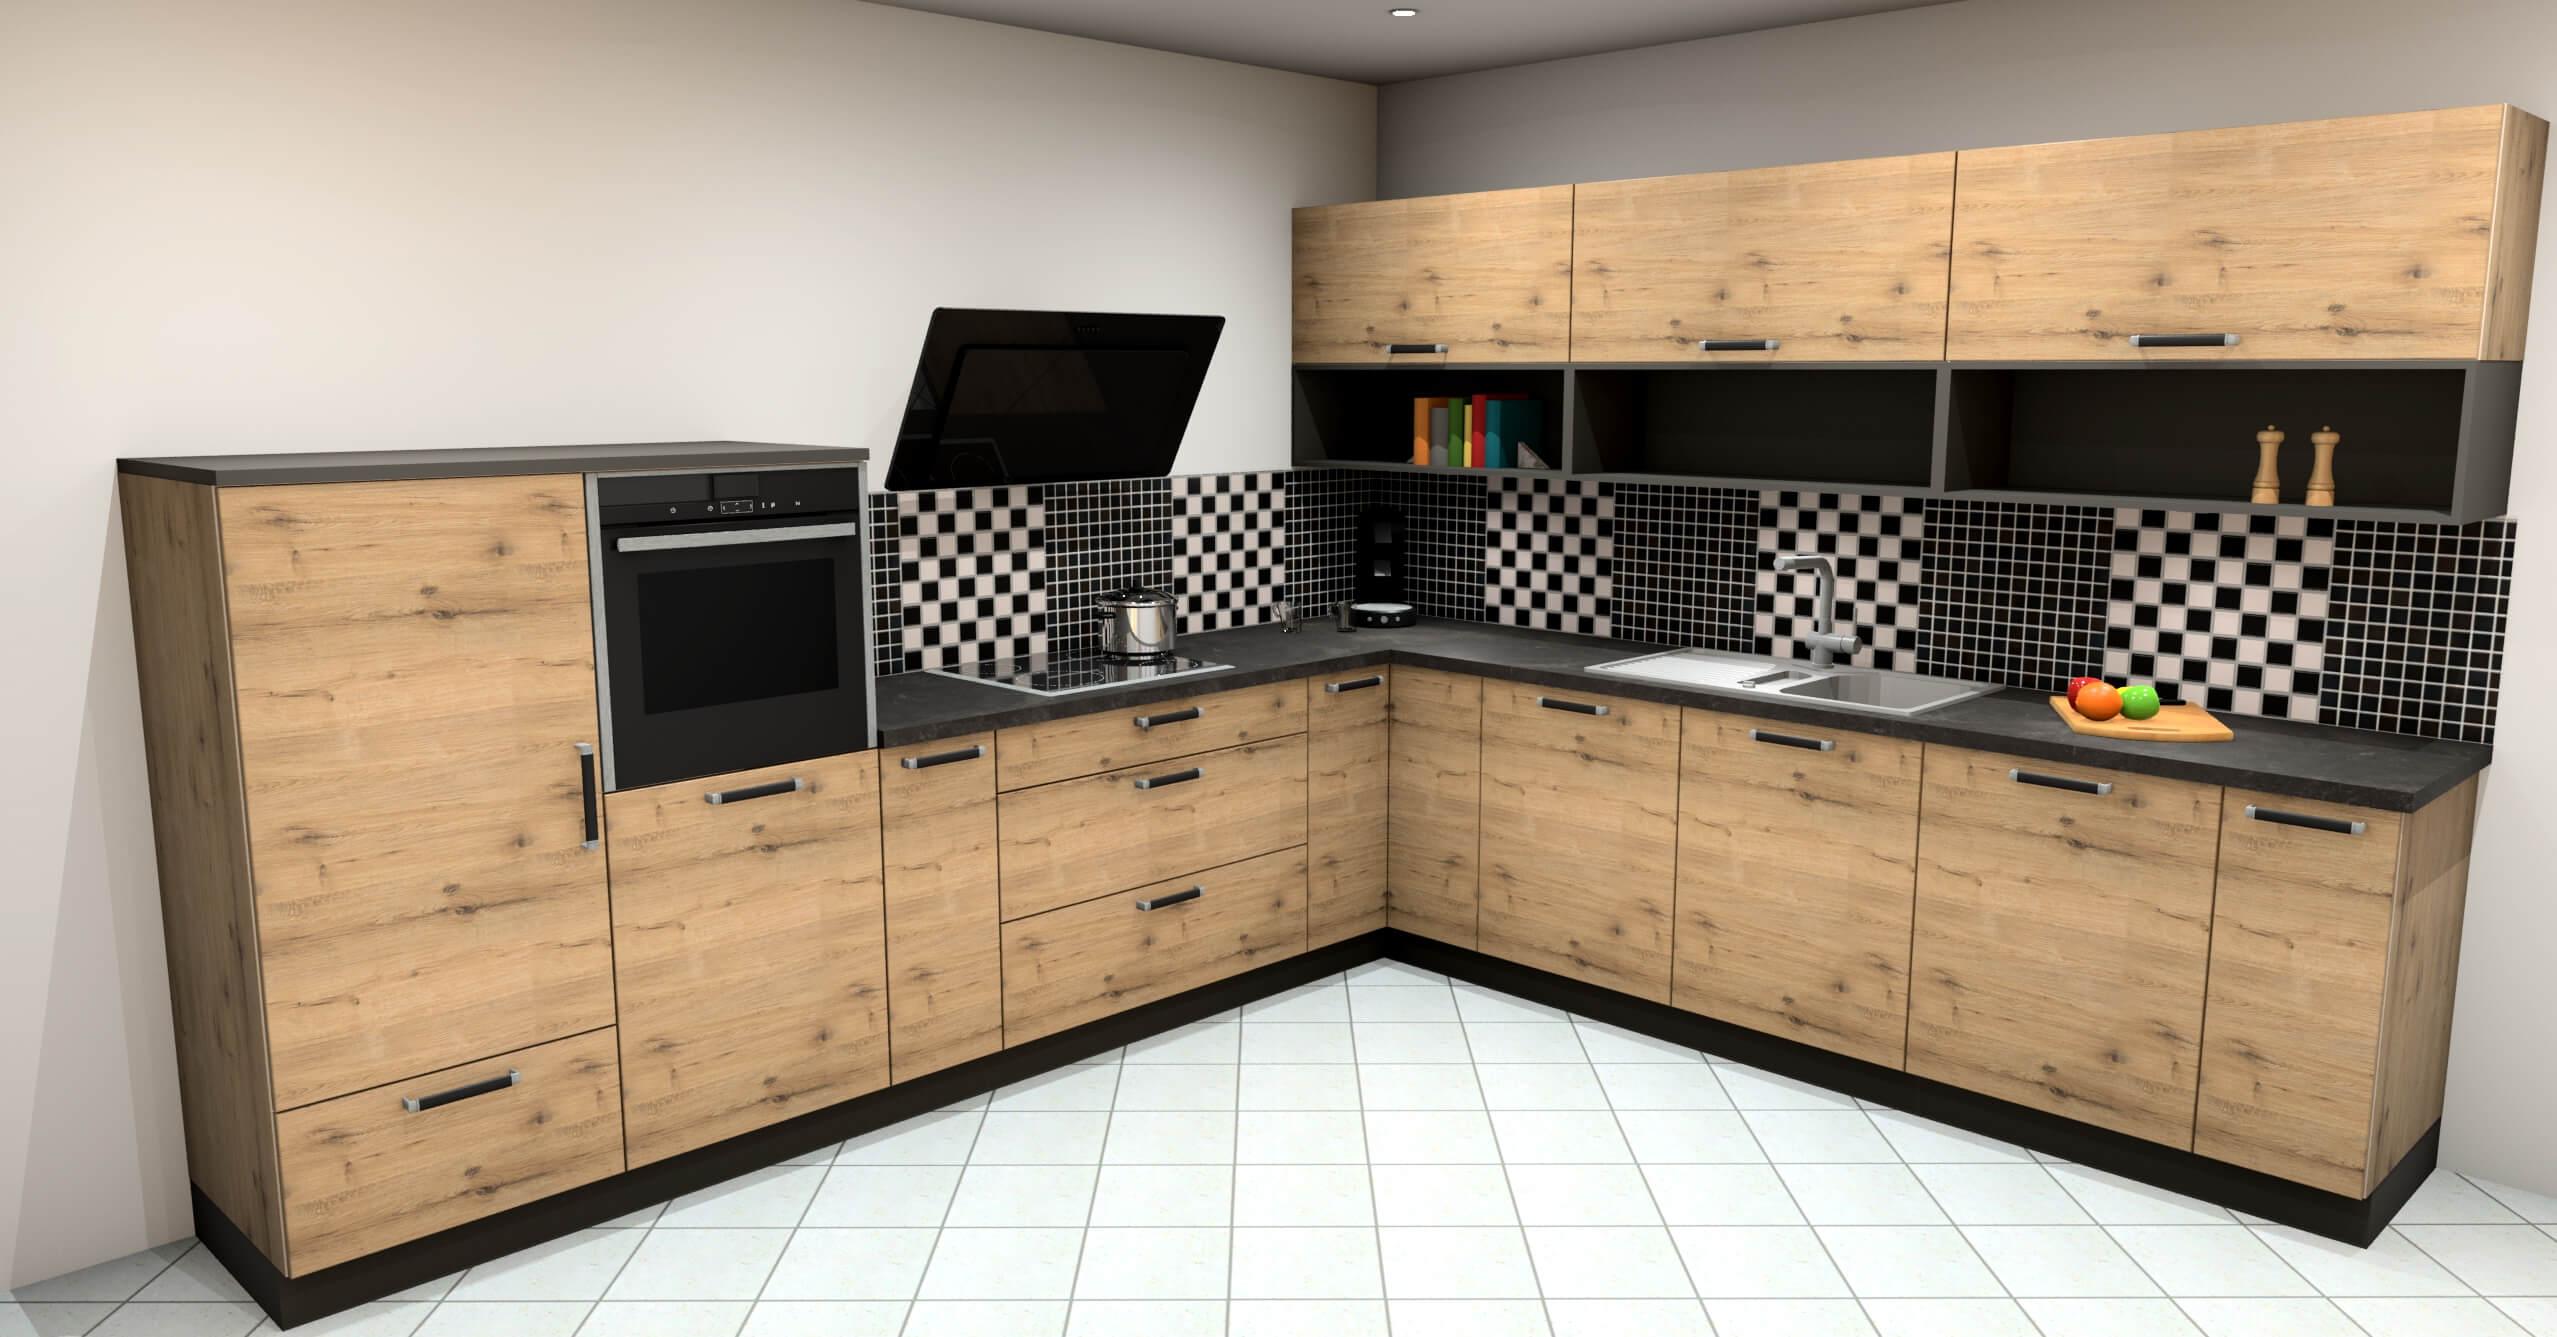 Full Size of Java Schiefer Arbeitsplatte Mbel Spanrad Nolte Kchen Modell Artwood Küche Sideboard Mit Arbeitsplatten Wohnzimmer Java Schiefer Arbeitsplatte